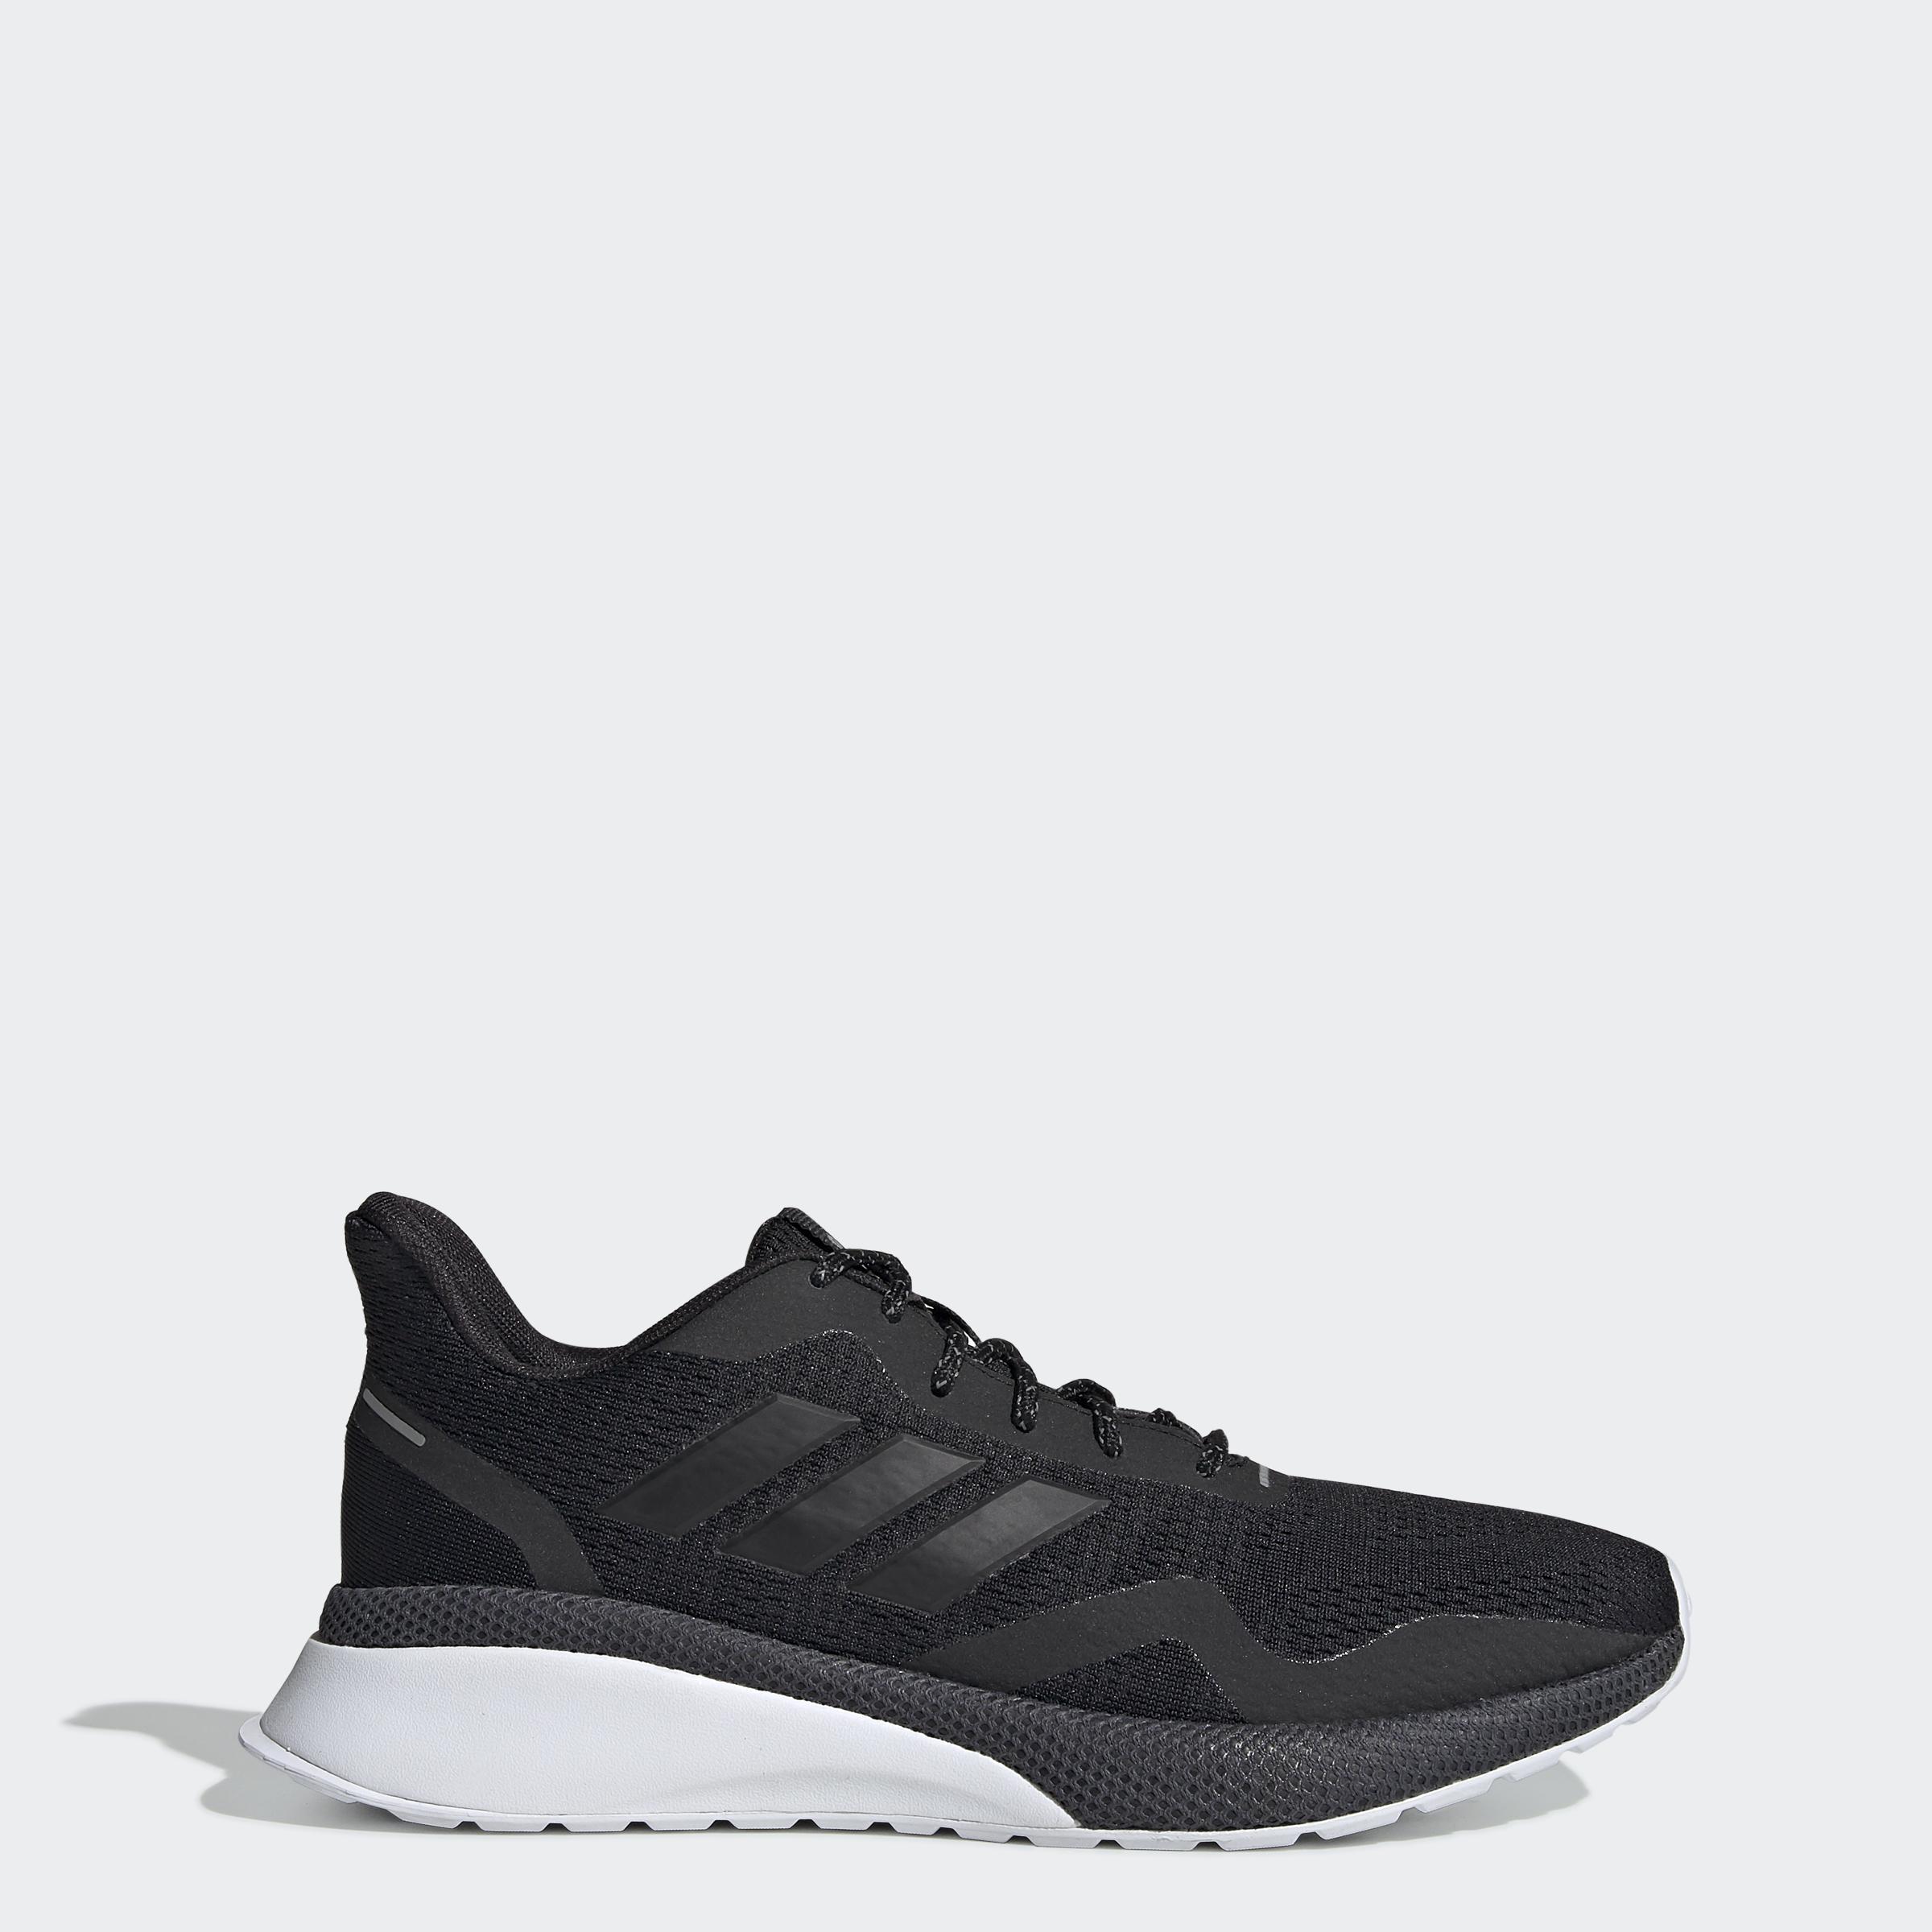 adidas-NOVAFVSE-X-Shoes-Women-039-s thumbnail 28